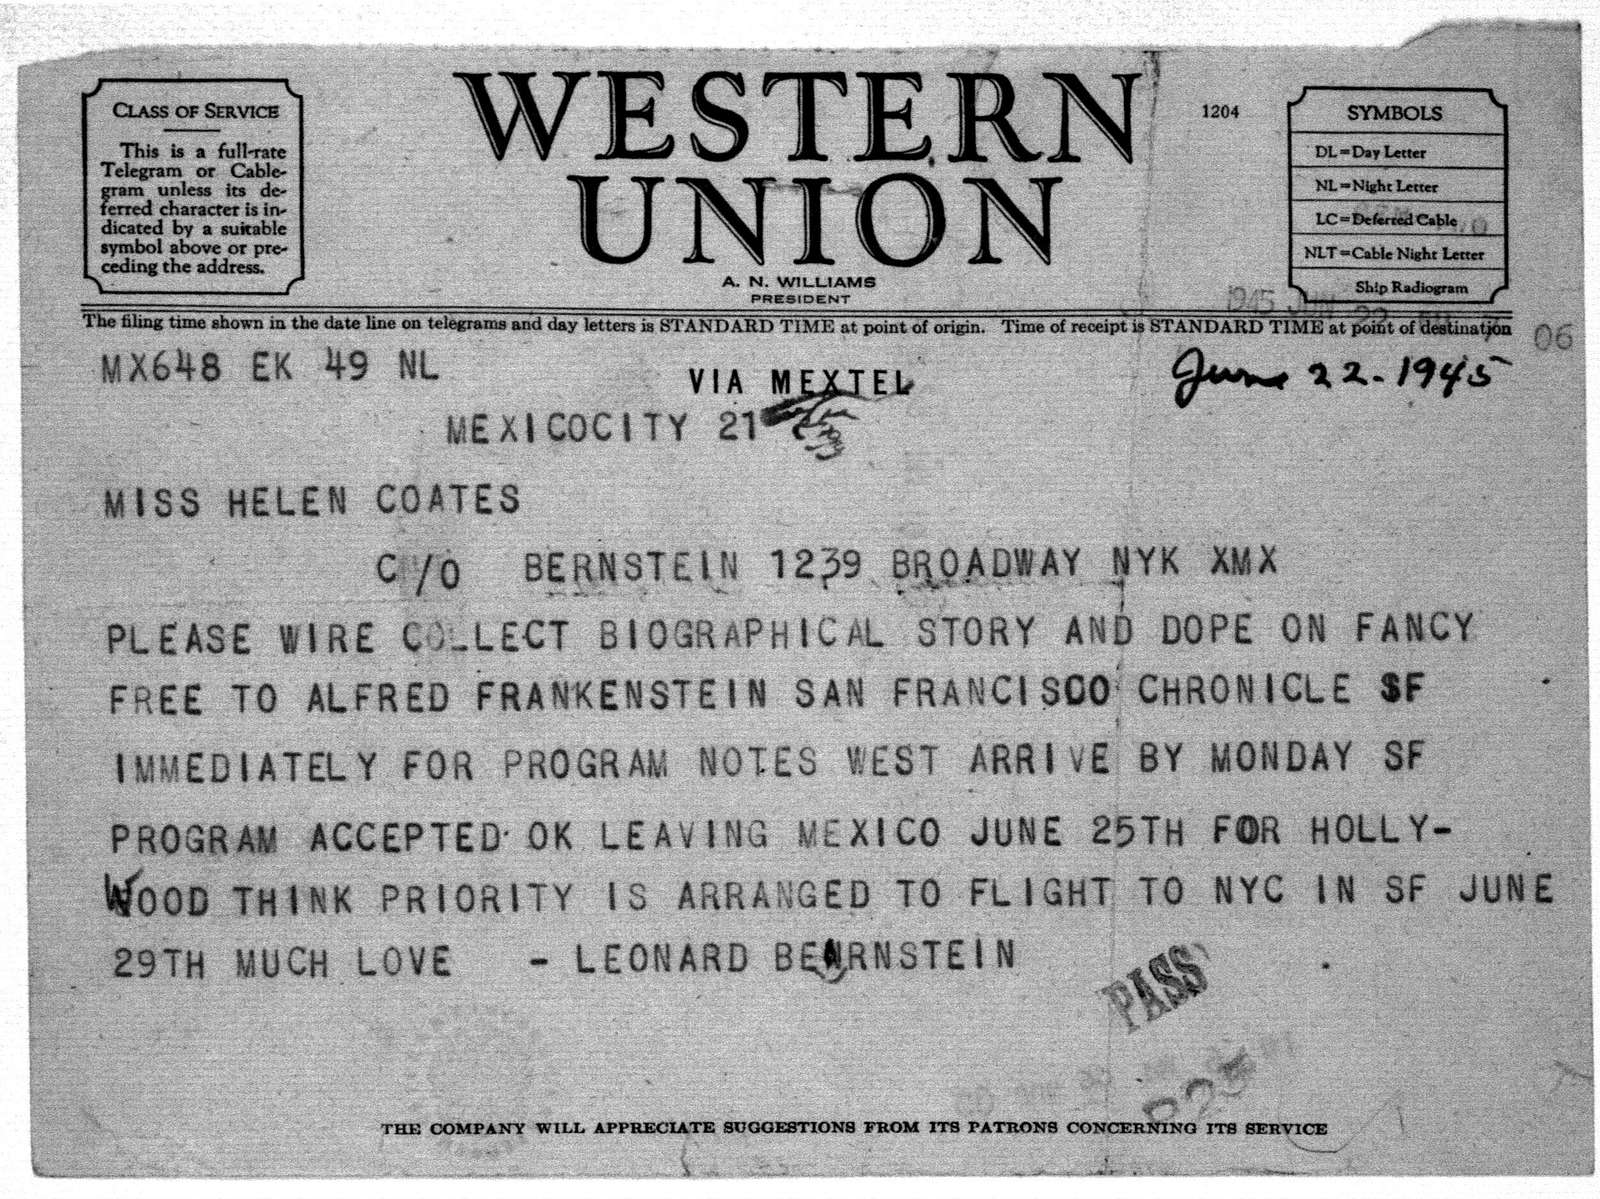 Letter from Leonard Bernstein to Helen Coates, June 22, 1945